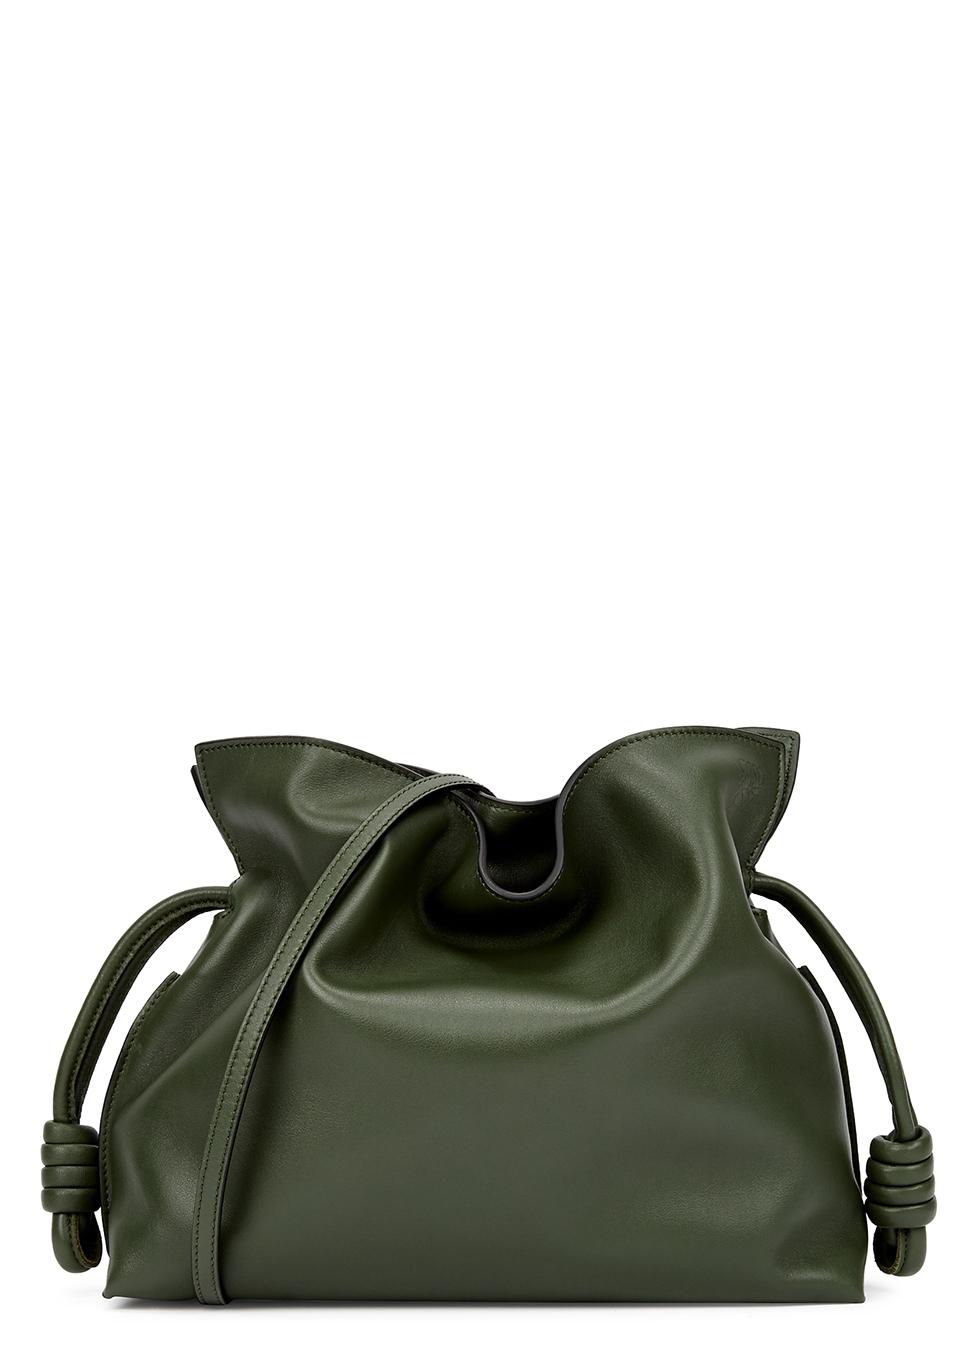 Flamenco dark green leather clutch